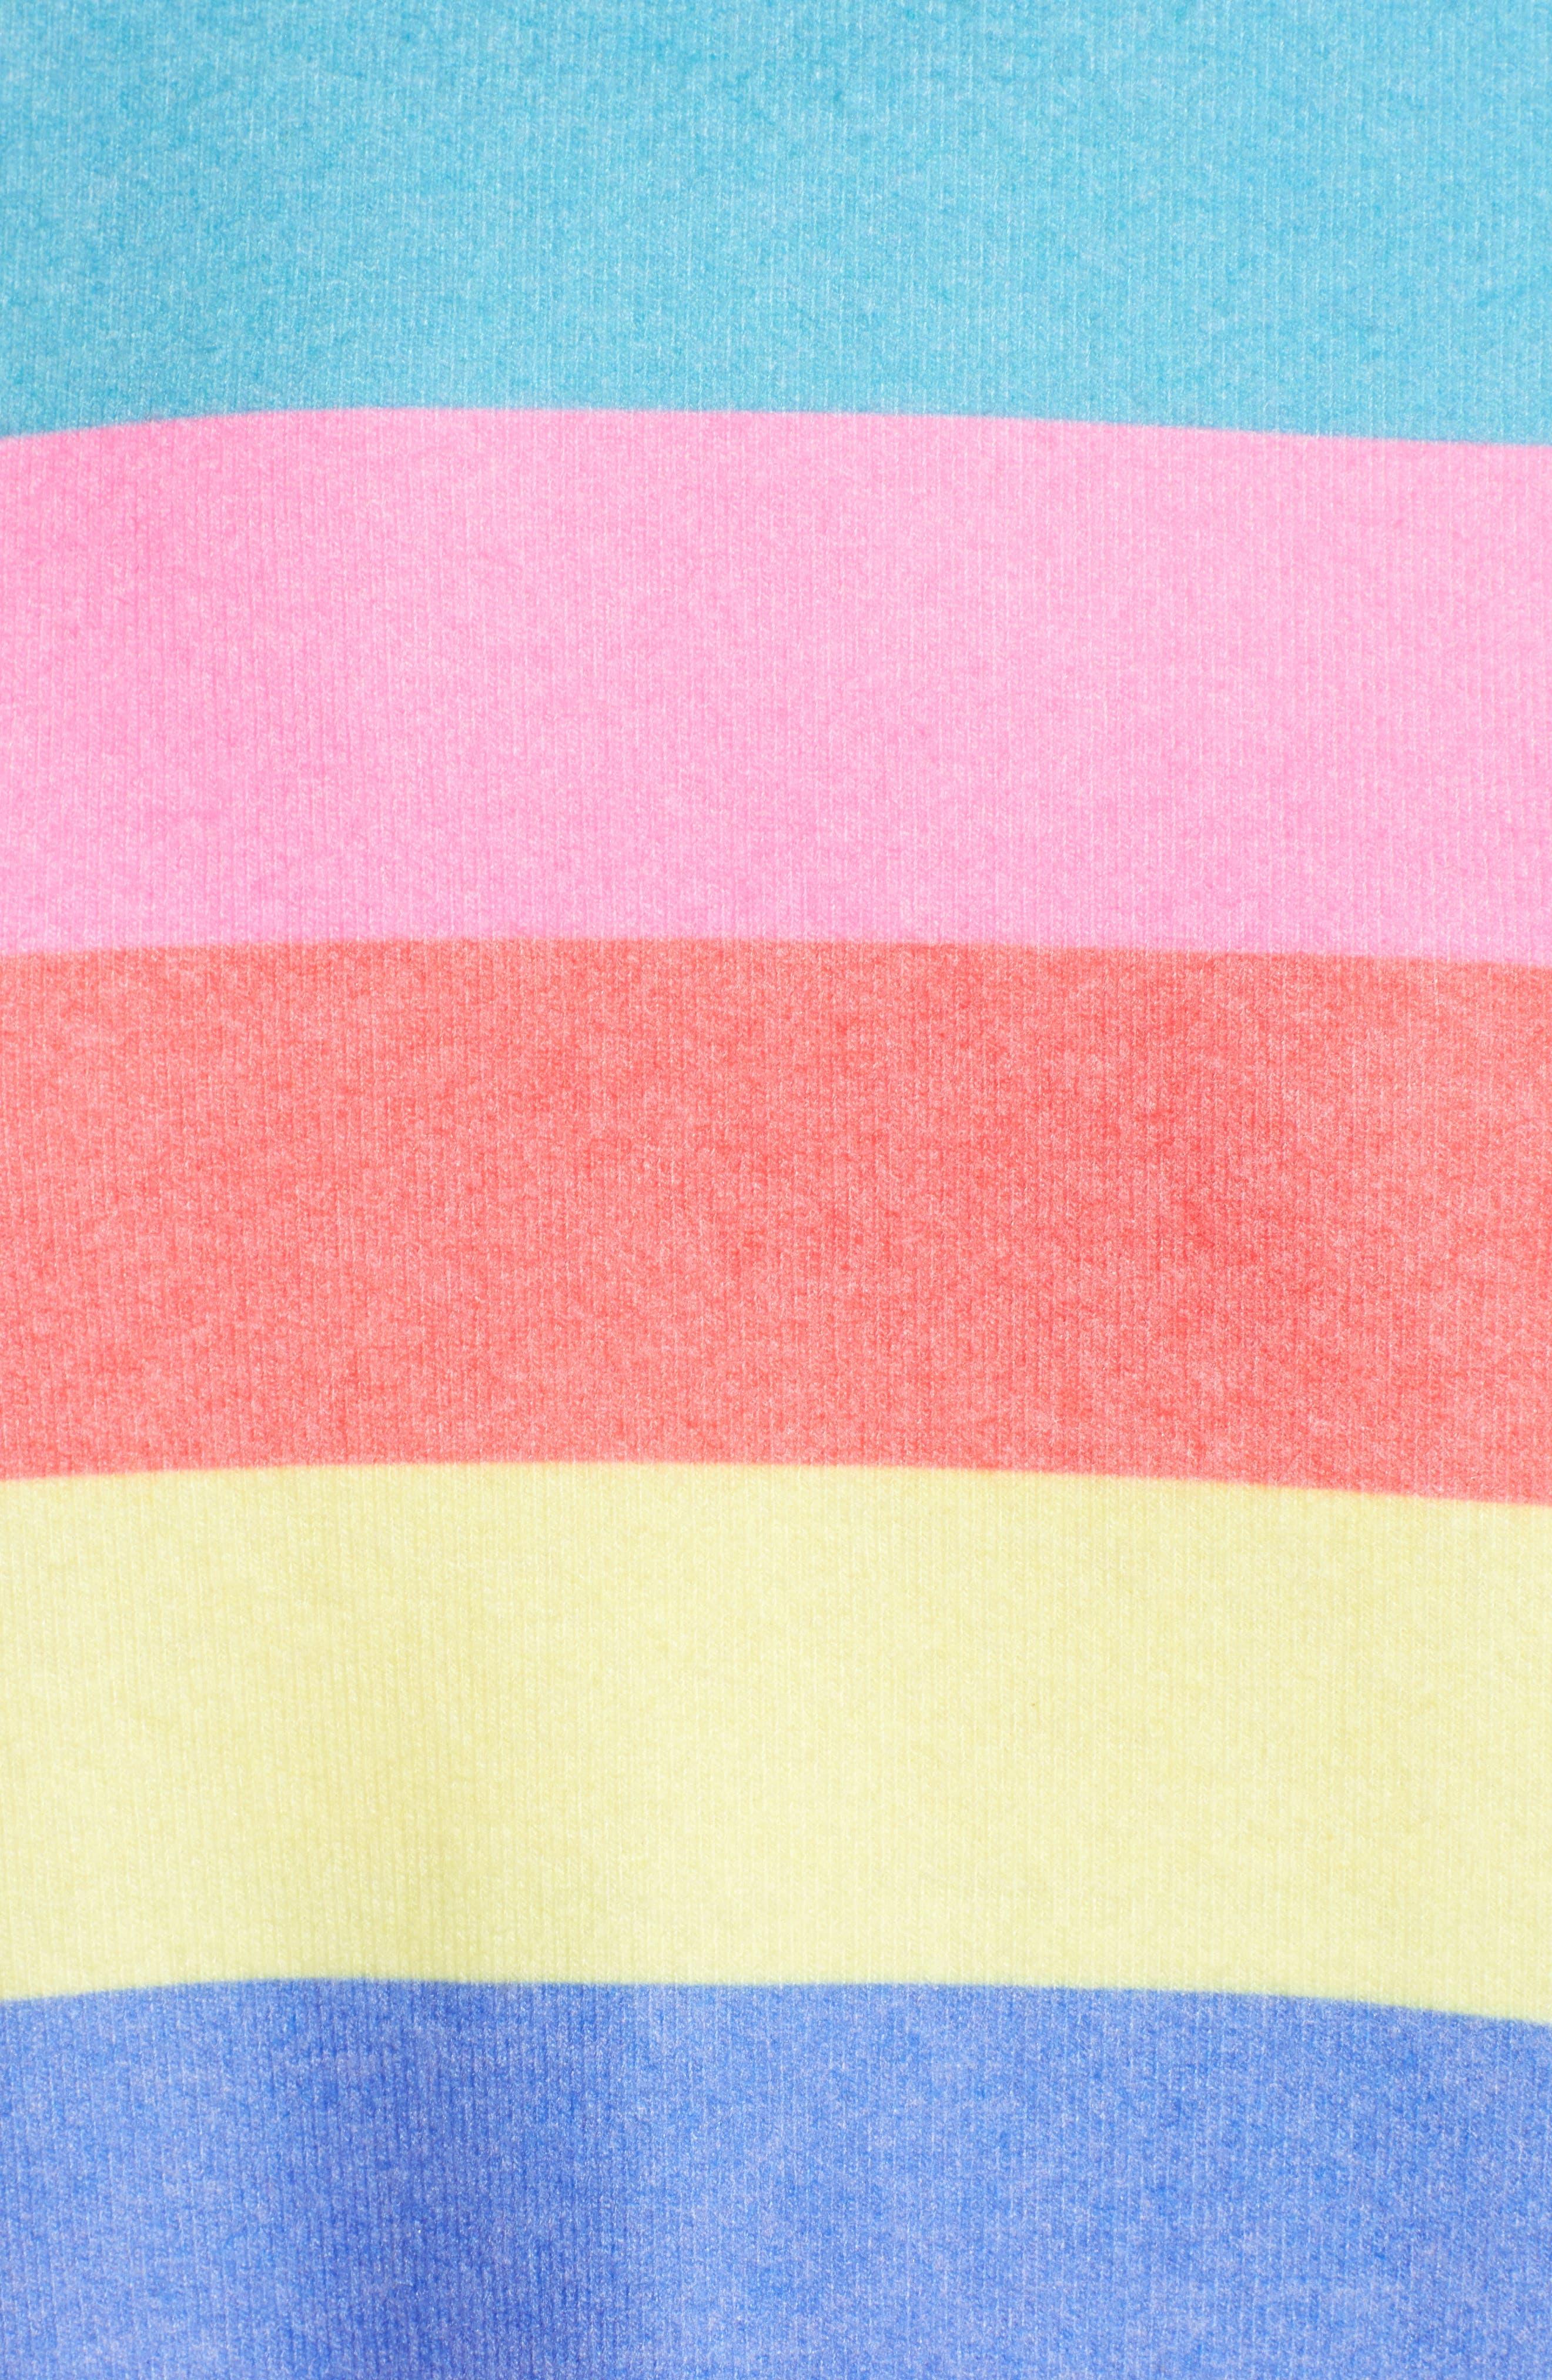 Castaway Roadtrip Sweatshirt,                             Alternate thumbnail 5, color,                             Multi Colored